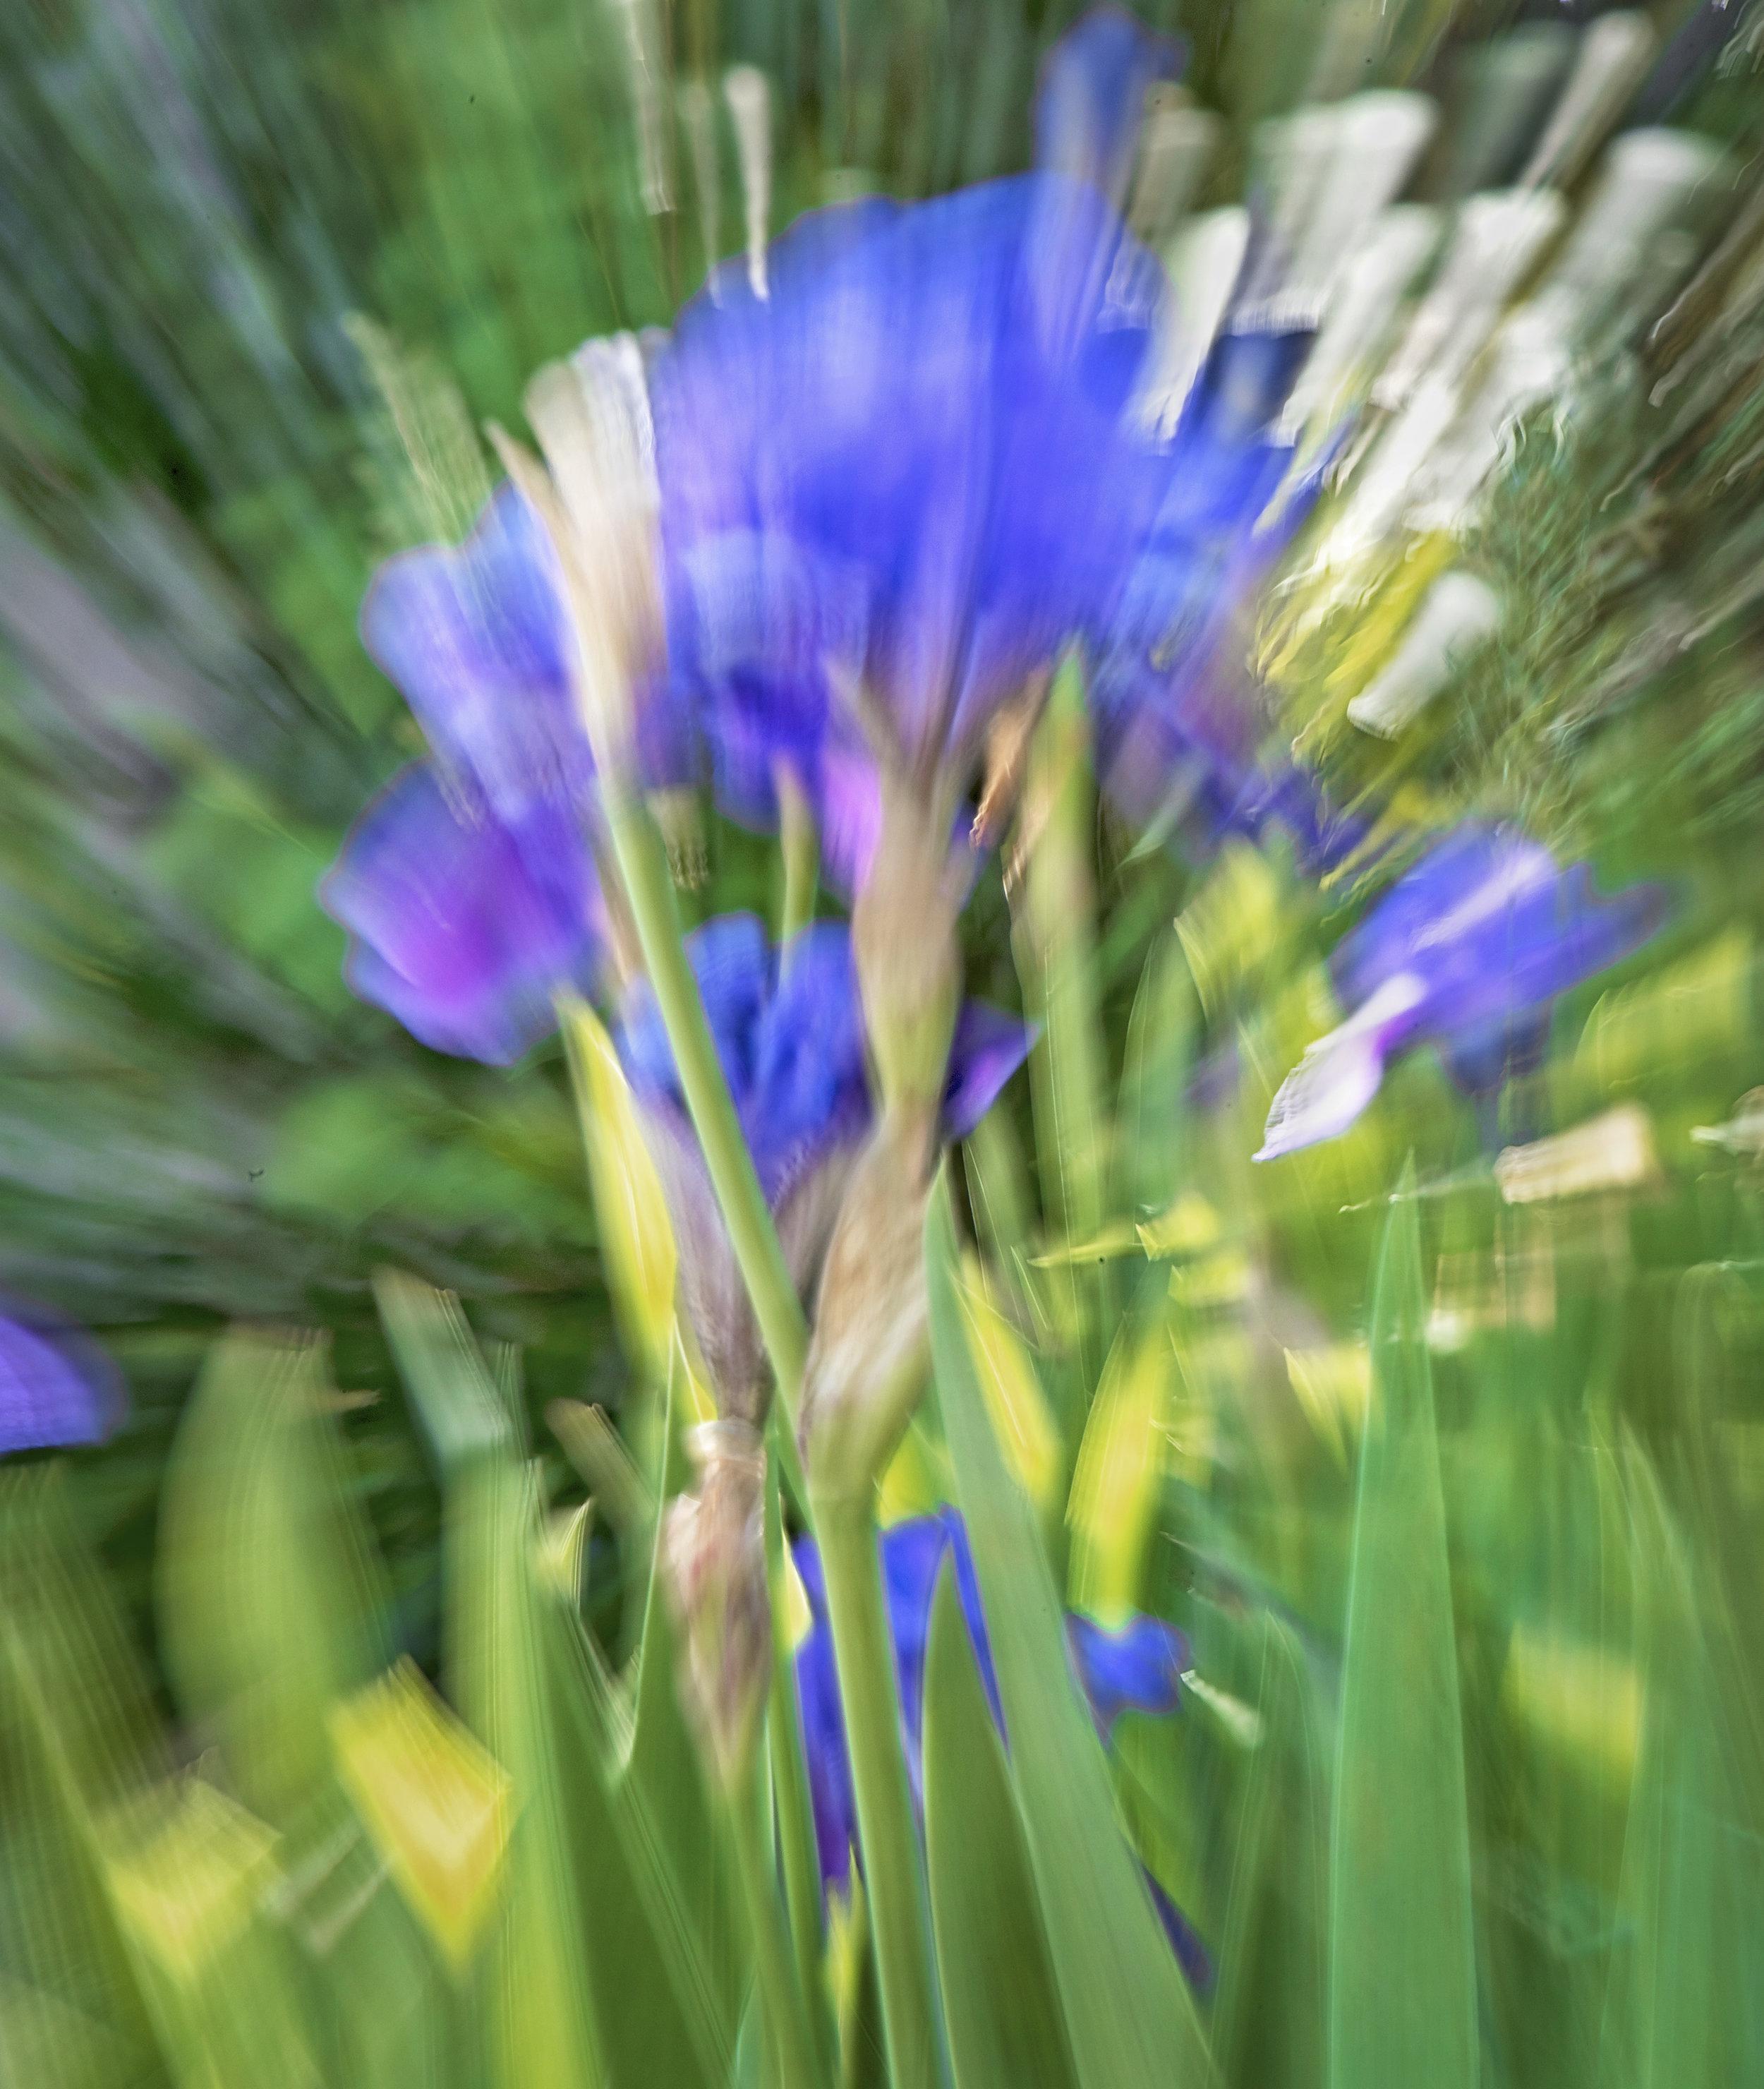 Iris Abstract Nikon 24-120 f4 ISO 63, f36, 1 second